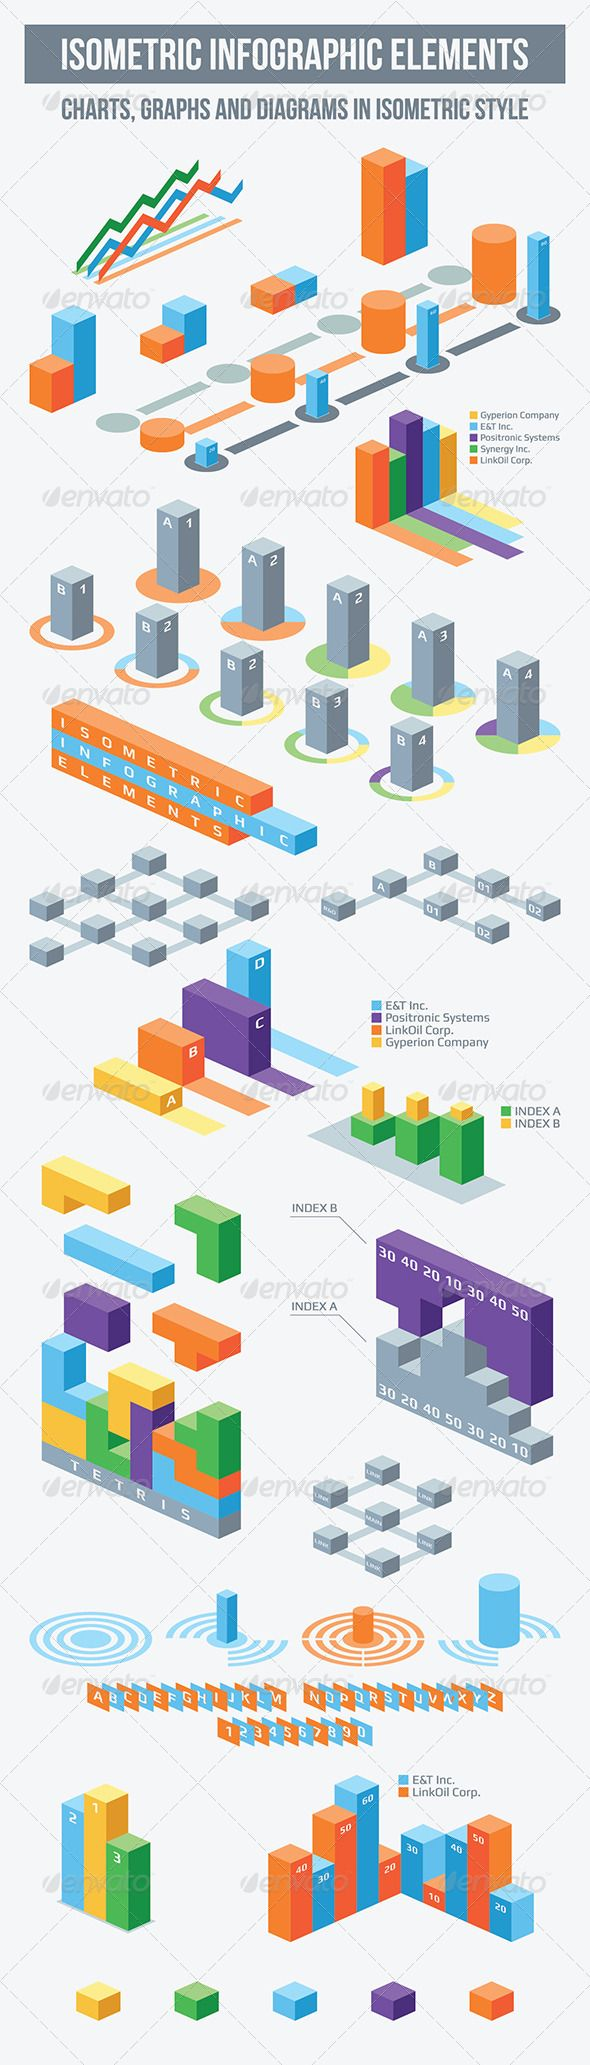 Isometric Infographic Elements #infografik Download: http://graphicriver.net/item/isometric-infographic-elements/7419498?ref=ksioks